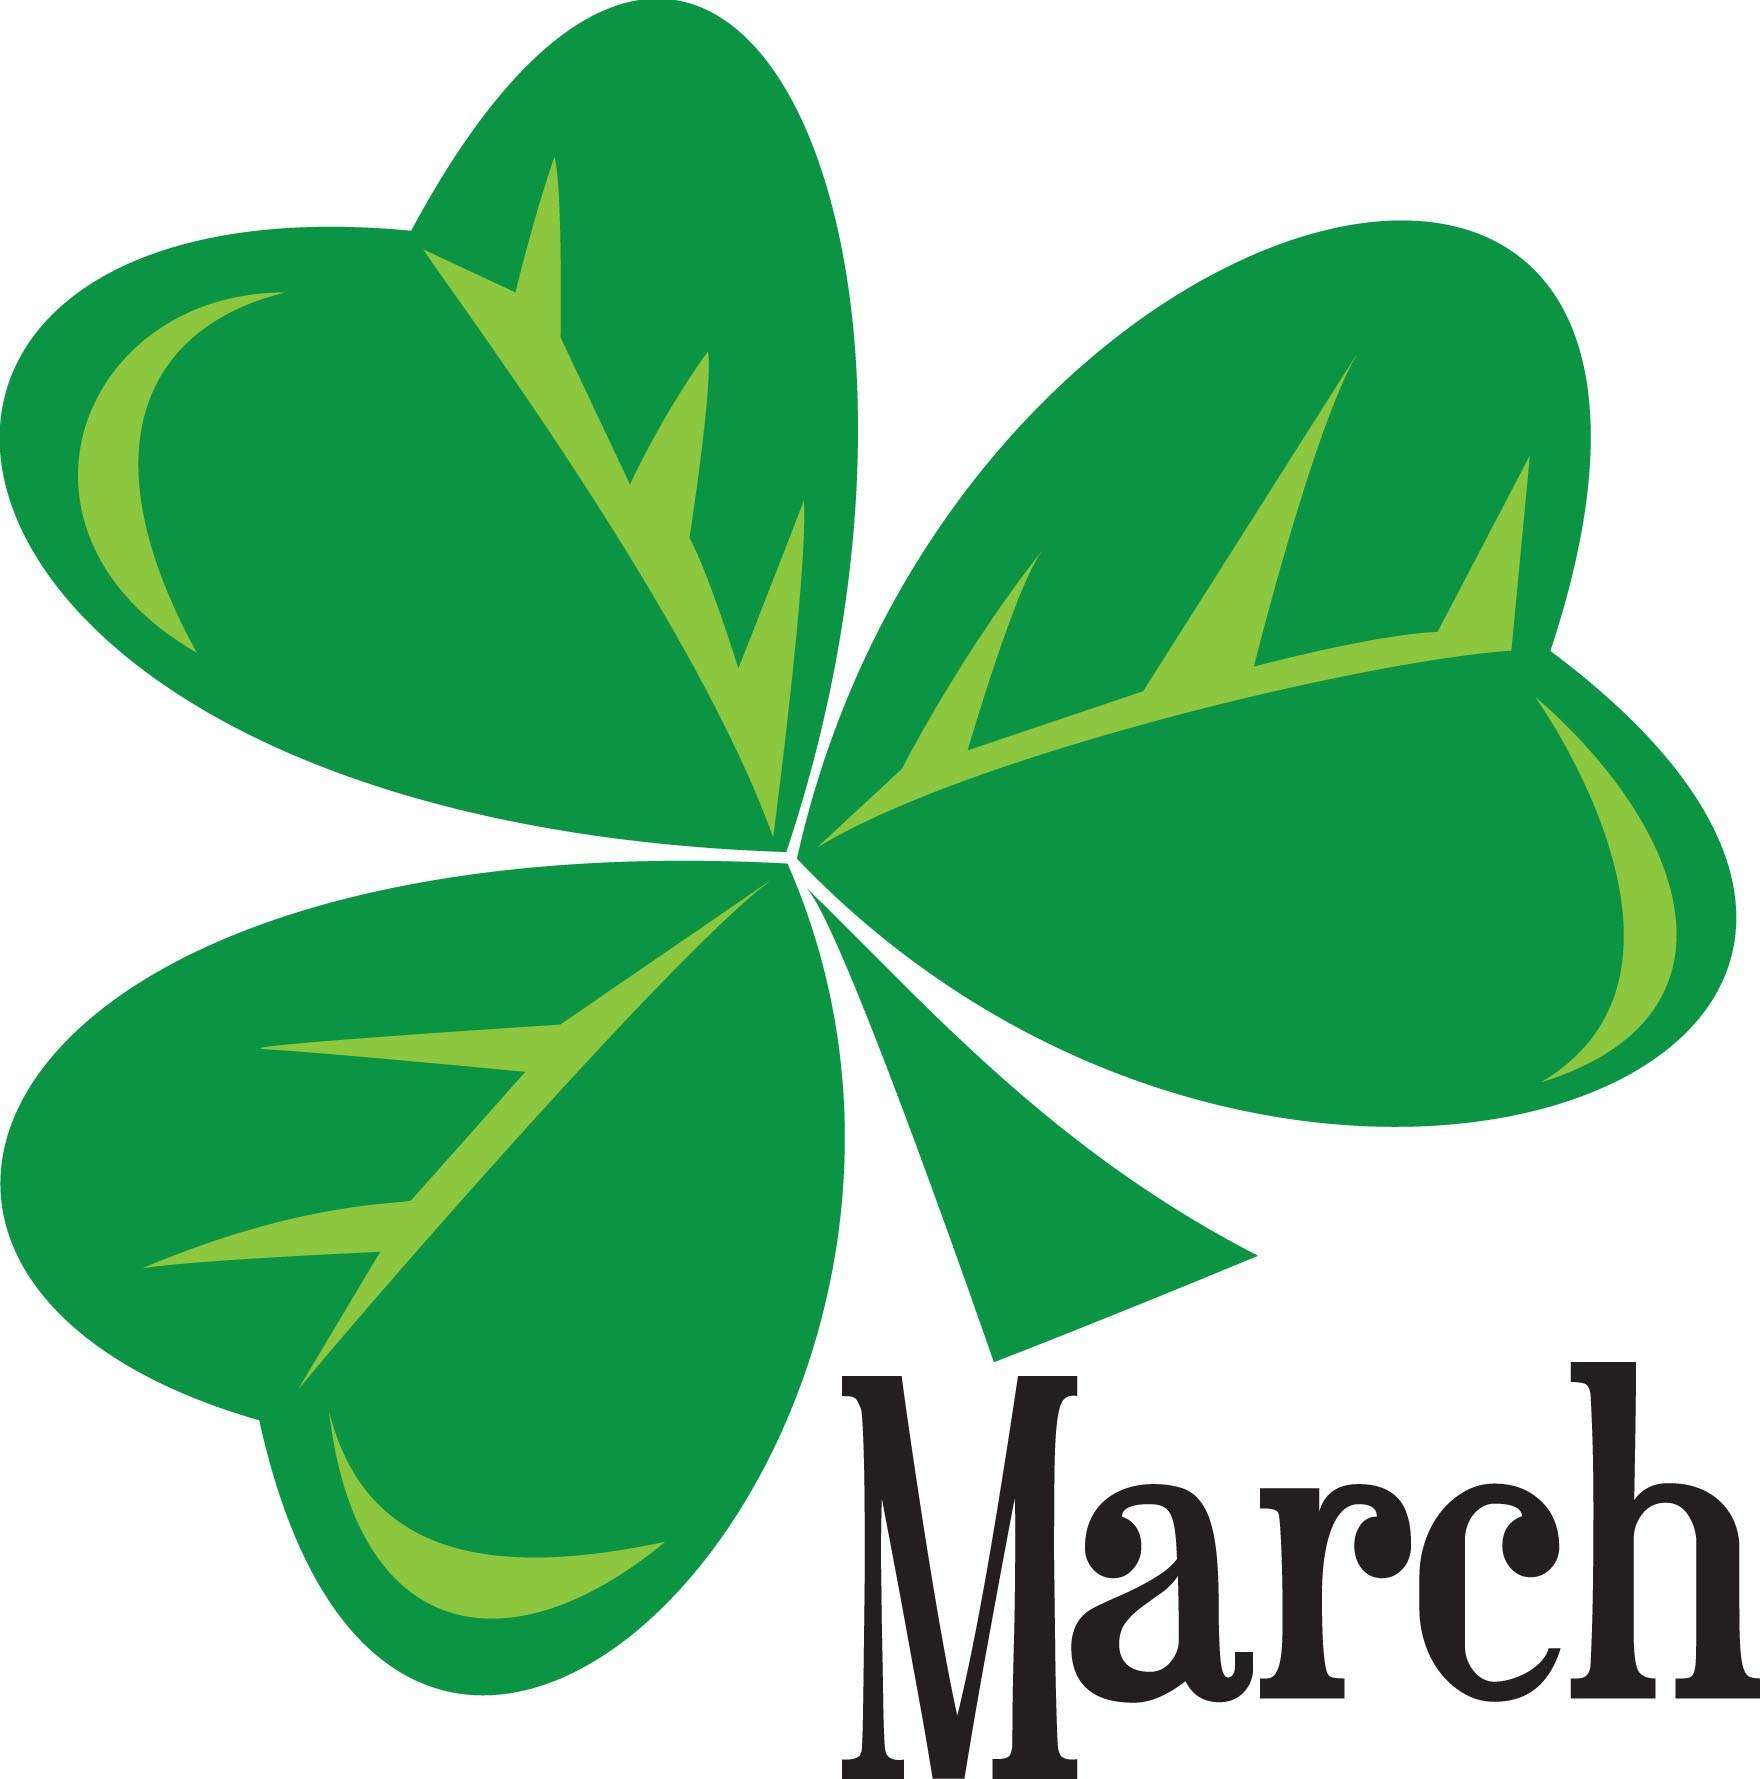 Clover clipart march newsletter  mar_9875c March Newsletter 2016